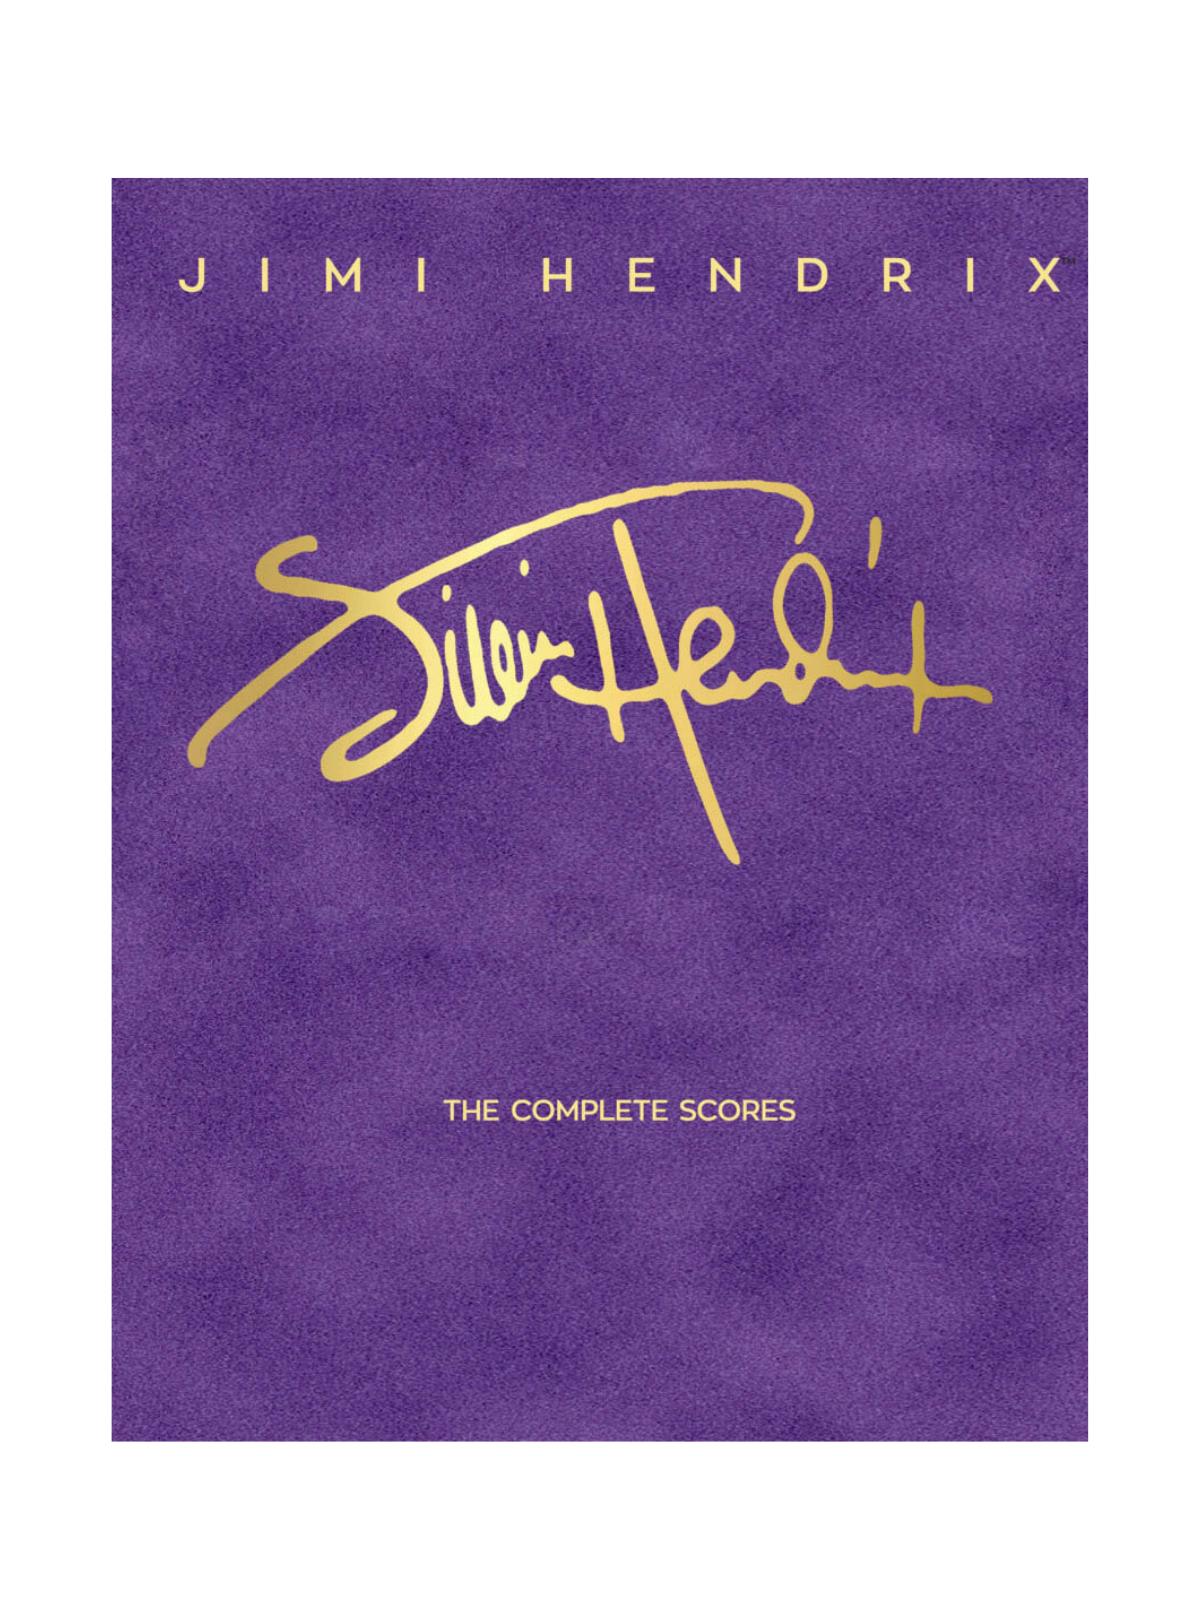 Jimi Hendrix: The Complete Scores